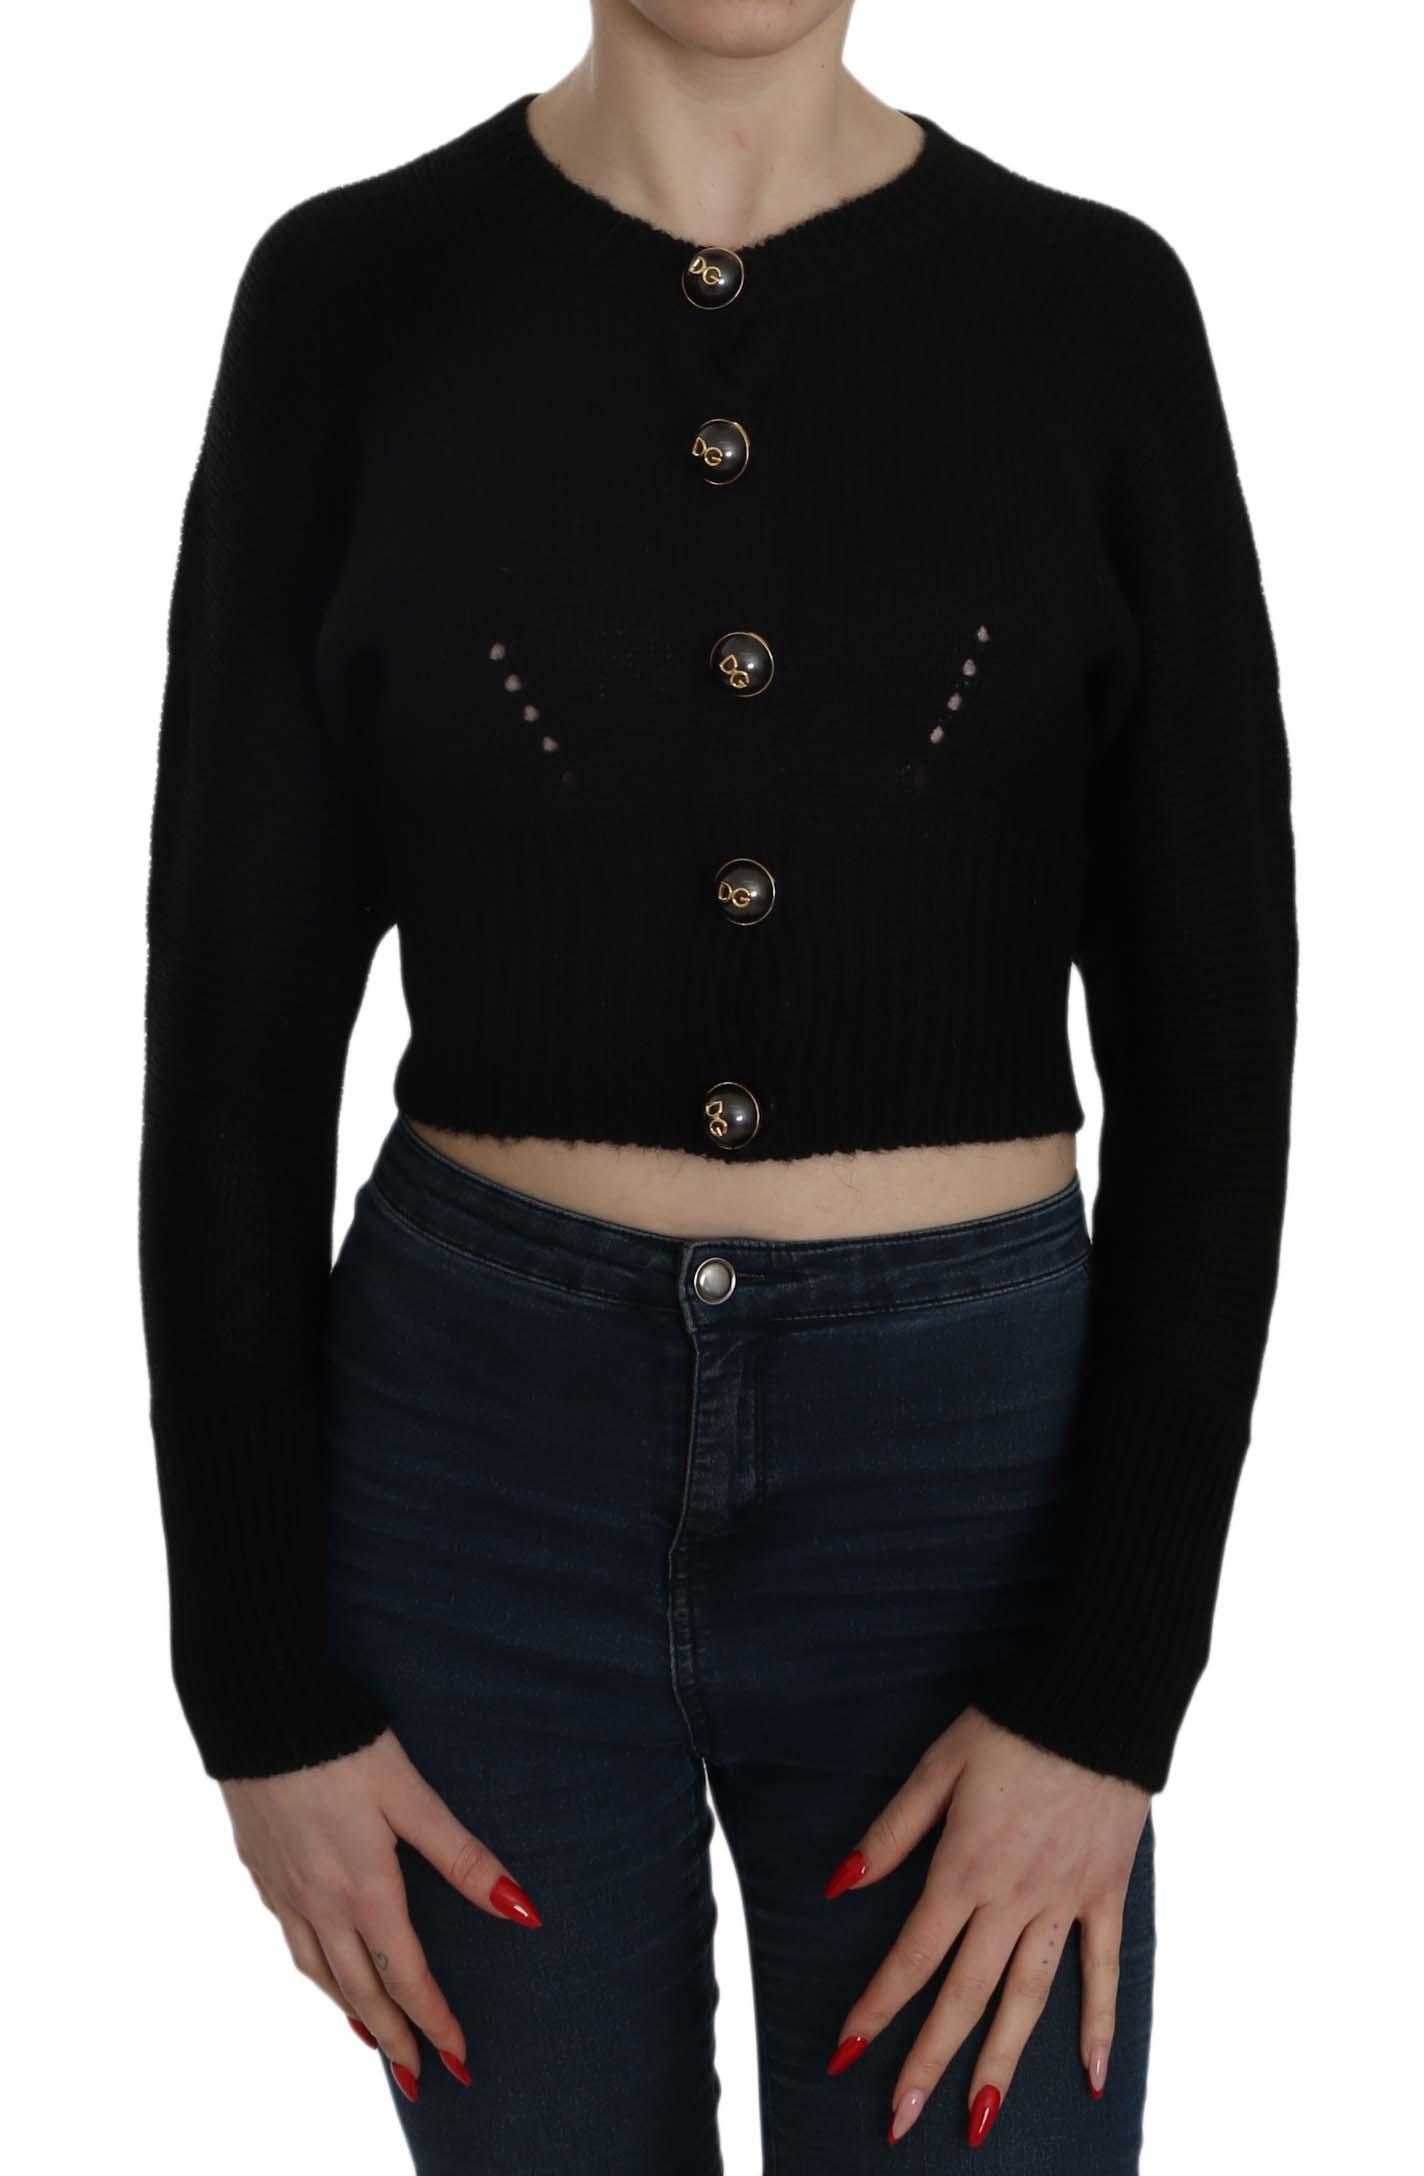 Dolce & Gabbana Women's Button Embellish Crop Cardigan Black TSH3714 - IT36 XXS